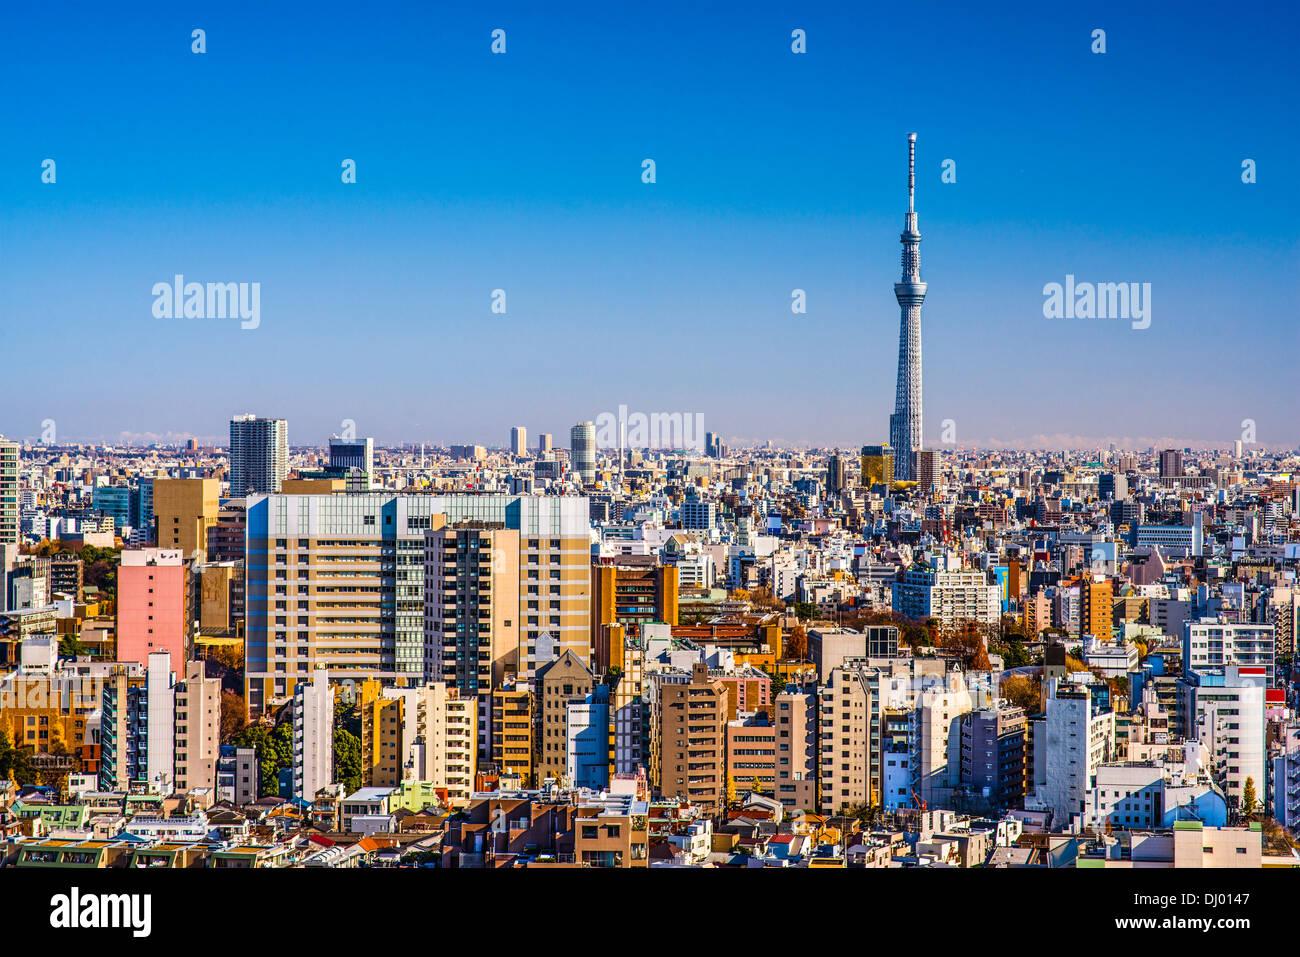 Tokio, Japón tarde skyline con Tokyo Sky Tree. Imagen De Stock